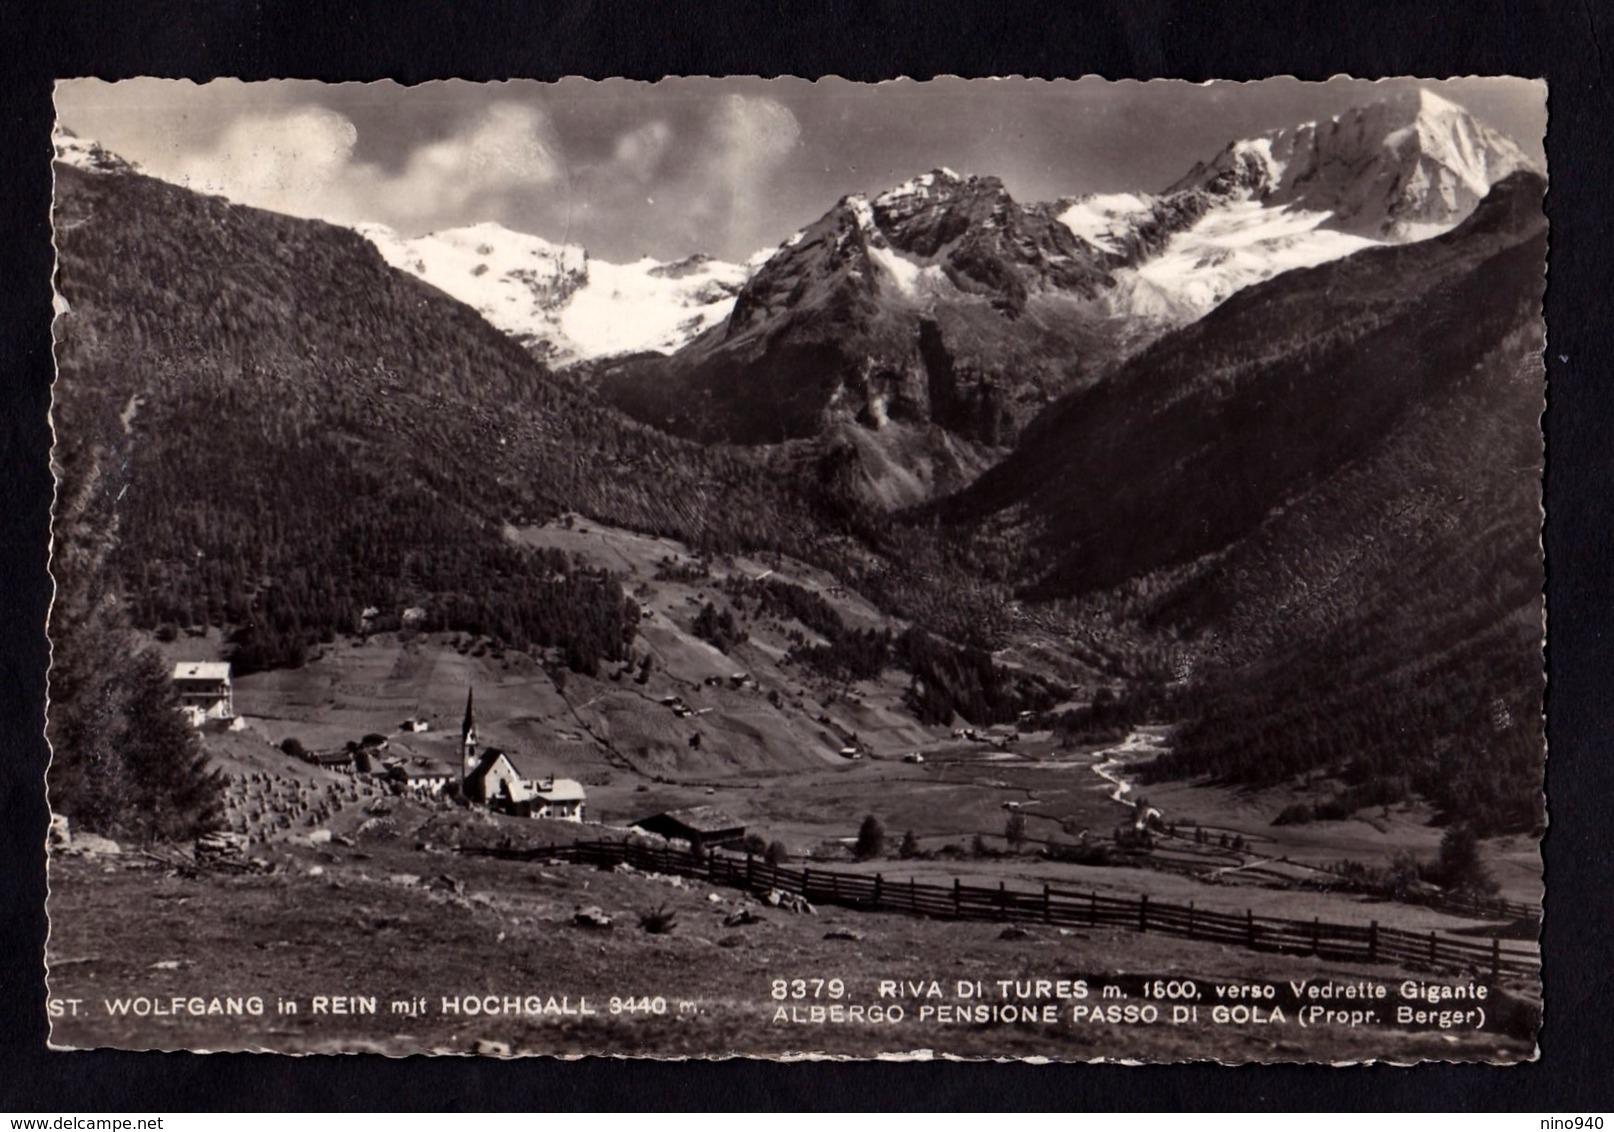 RIVA DI TURES (BZ) - Verso Vedrette Gigante - St. Wolfang Mit Cochgall - F/P - V: 1950 - Genova (Genoa)